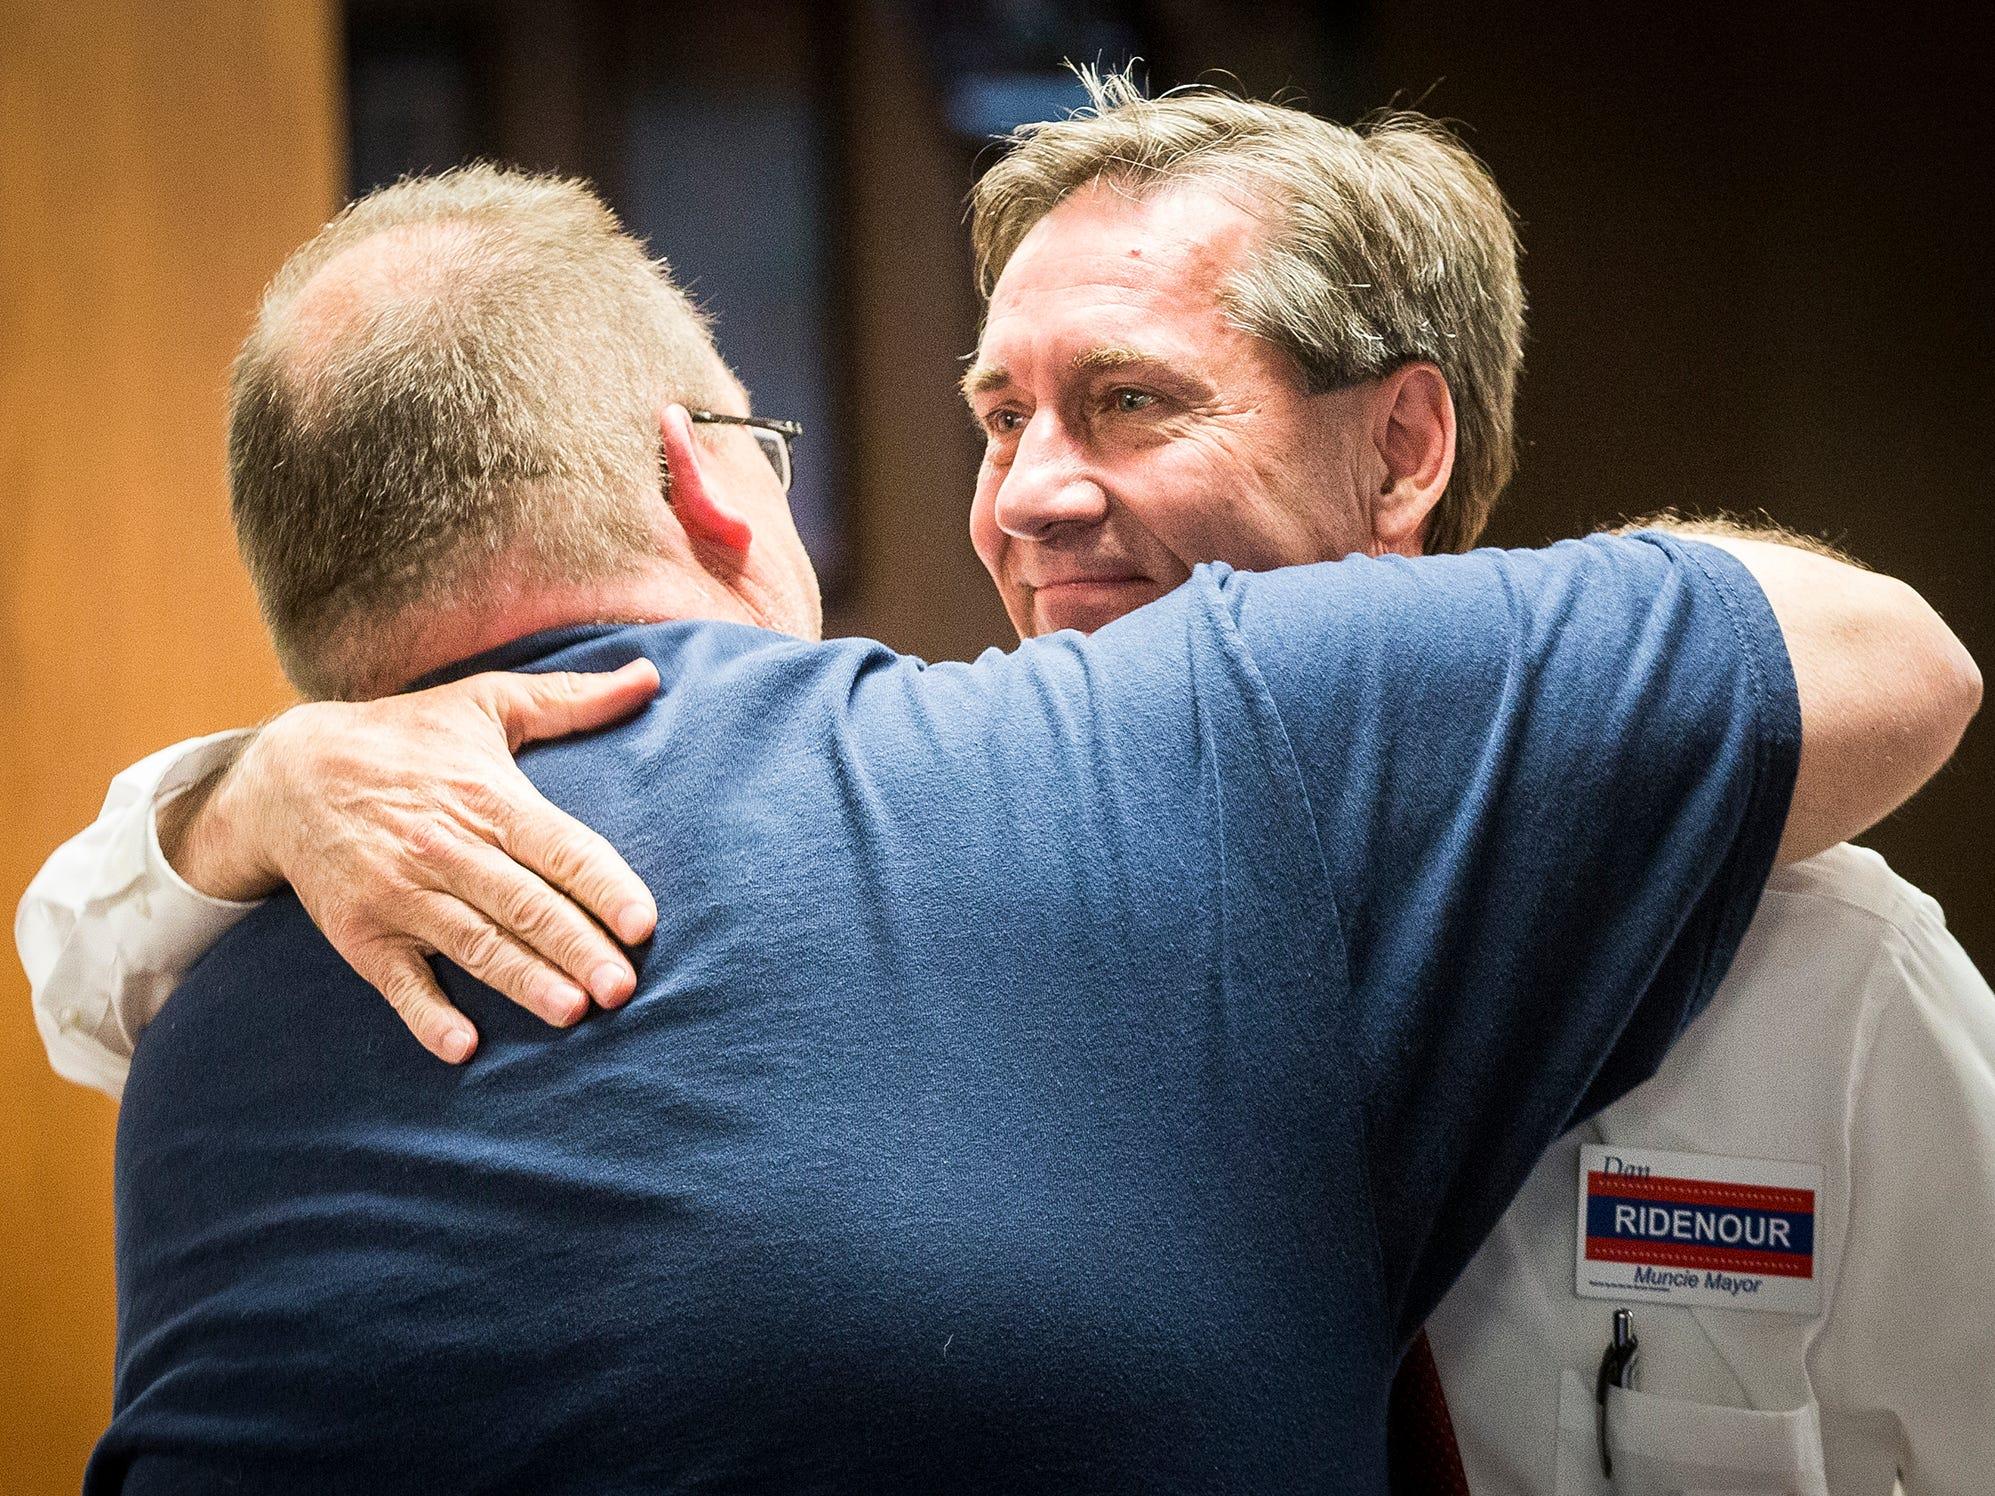 Republicans nominated mayoral candidate Dan Ridenour Tuesday. Nate Jones and Tom Bracken were also seeking nomination.